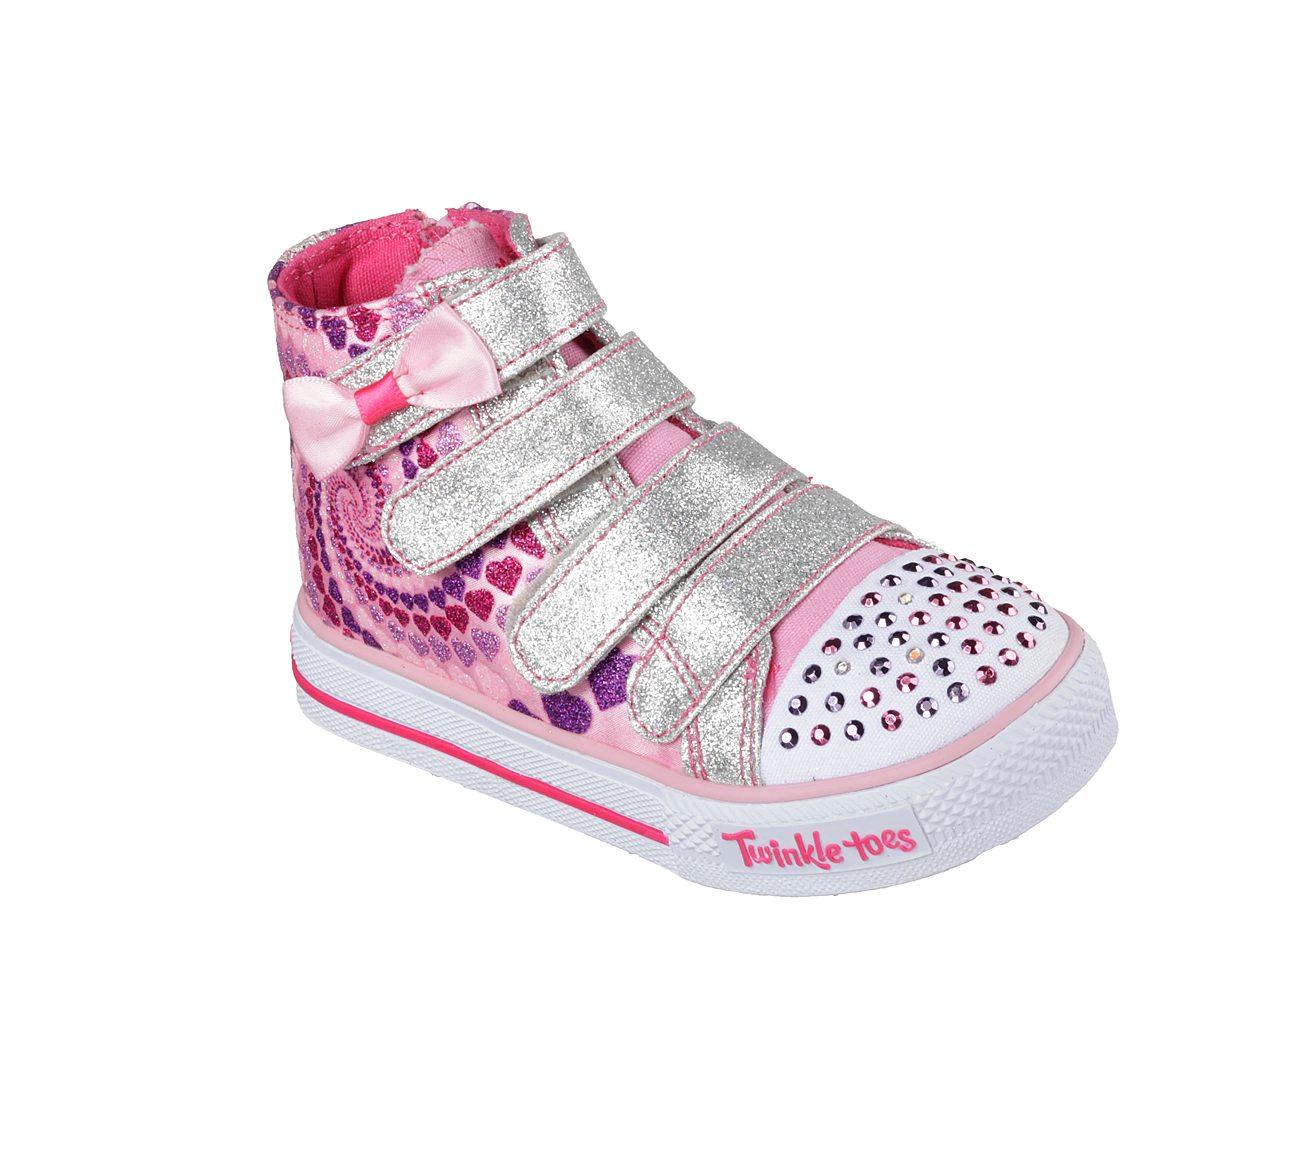 Twinkle Toes: Shuffles Lil Skippers